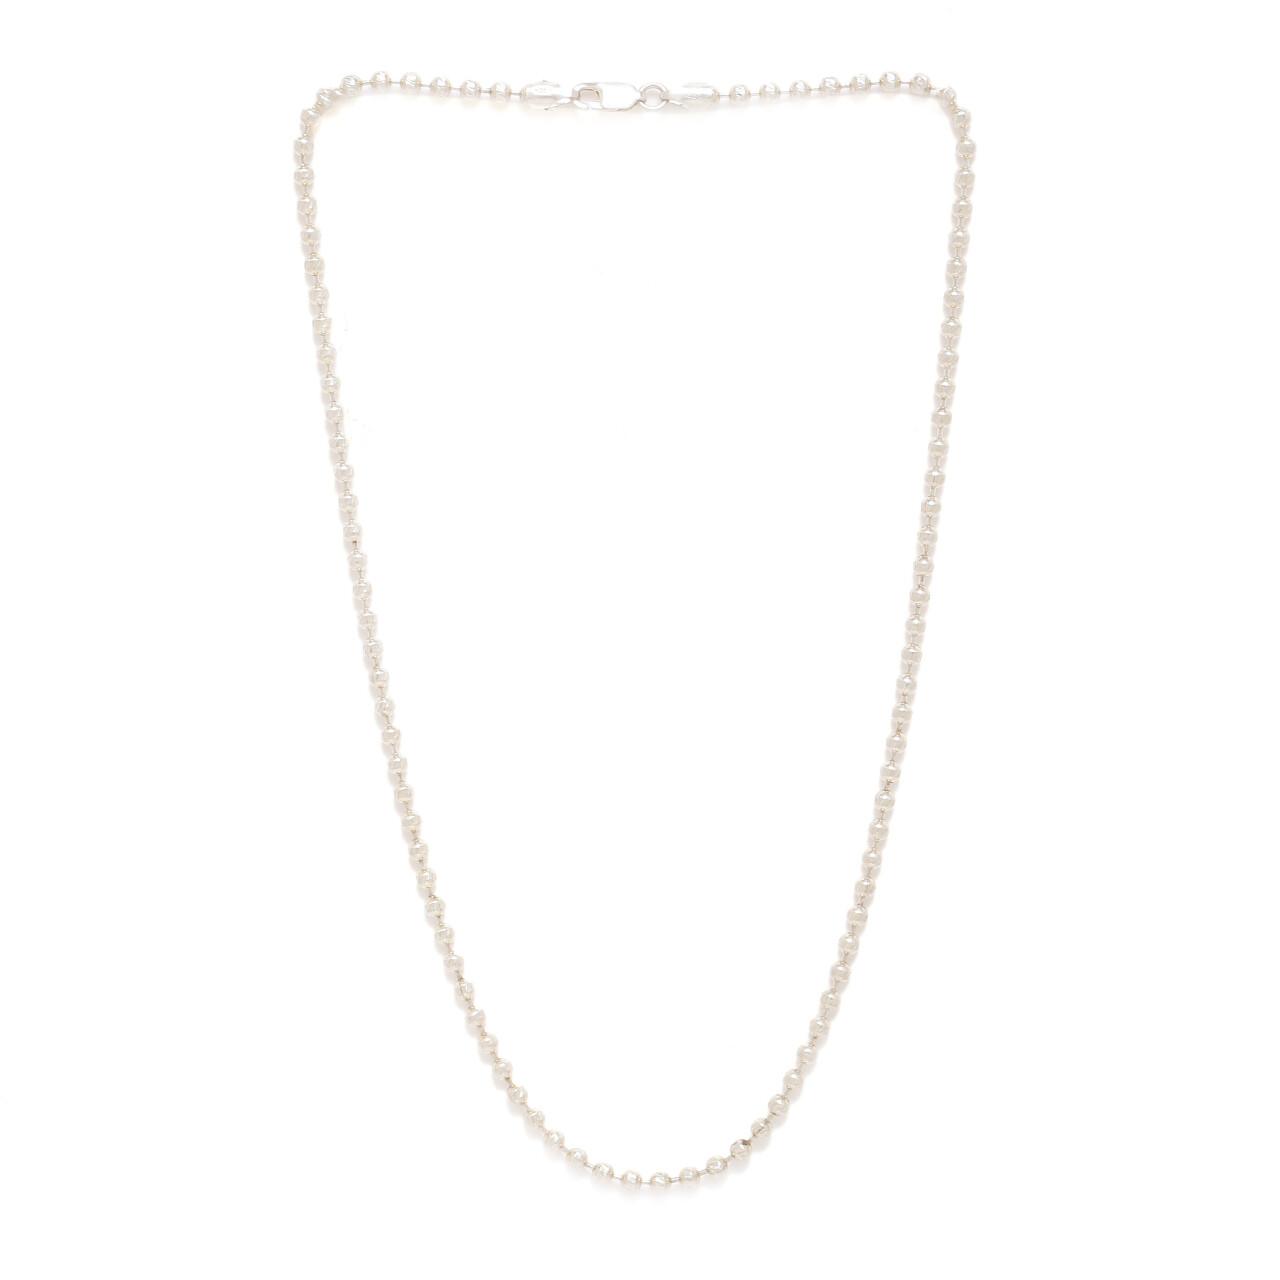 IndusDiva Plain Beads Necklace Chain